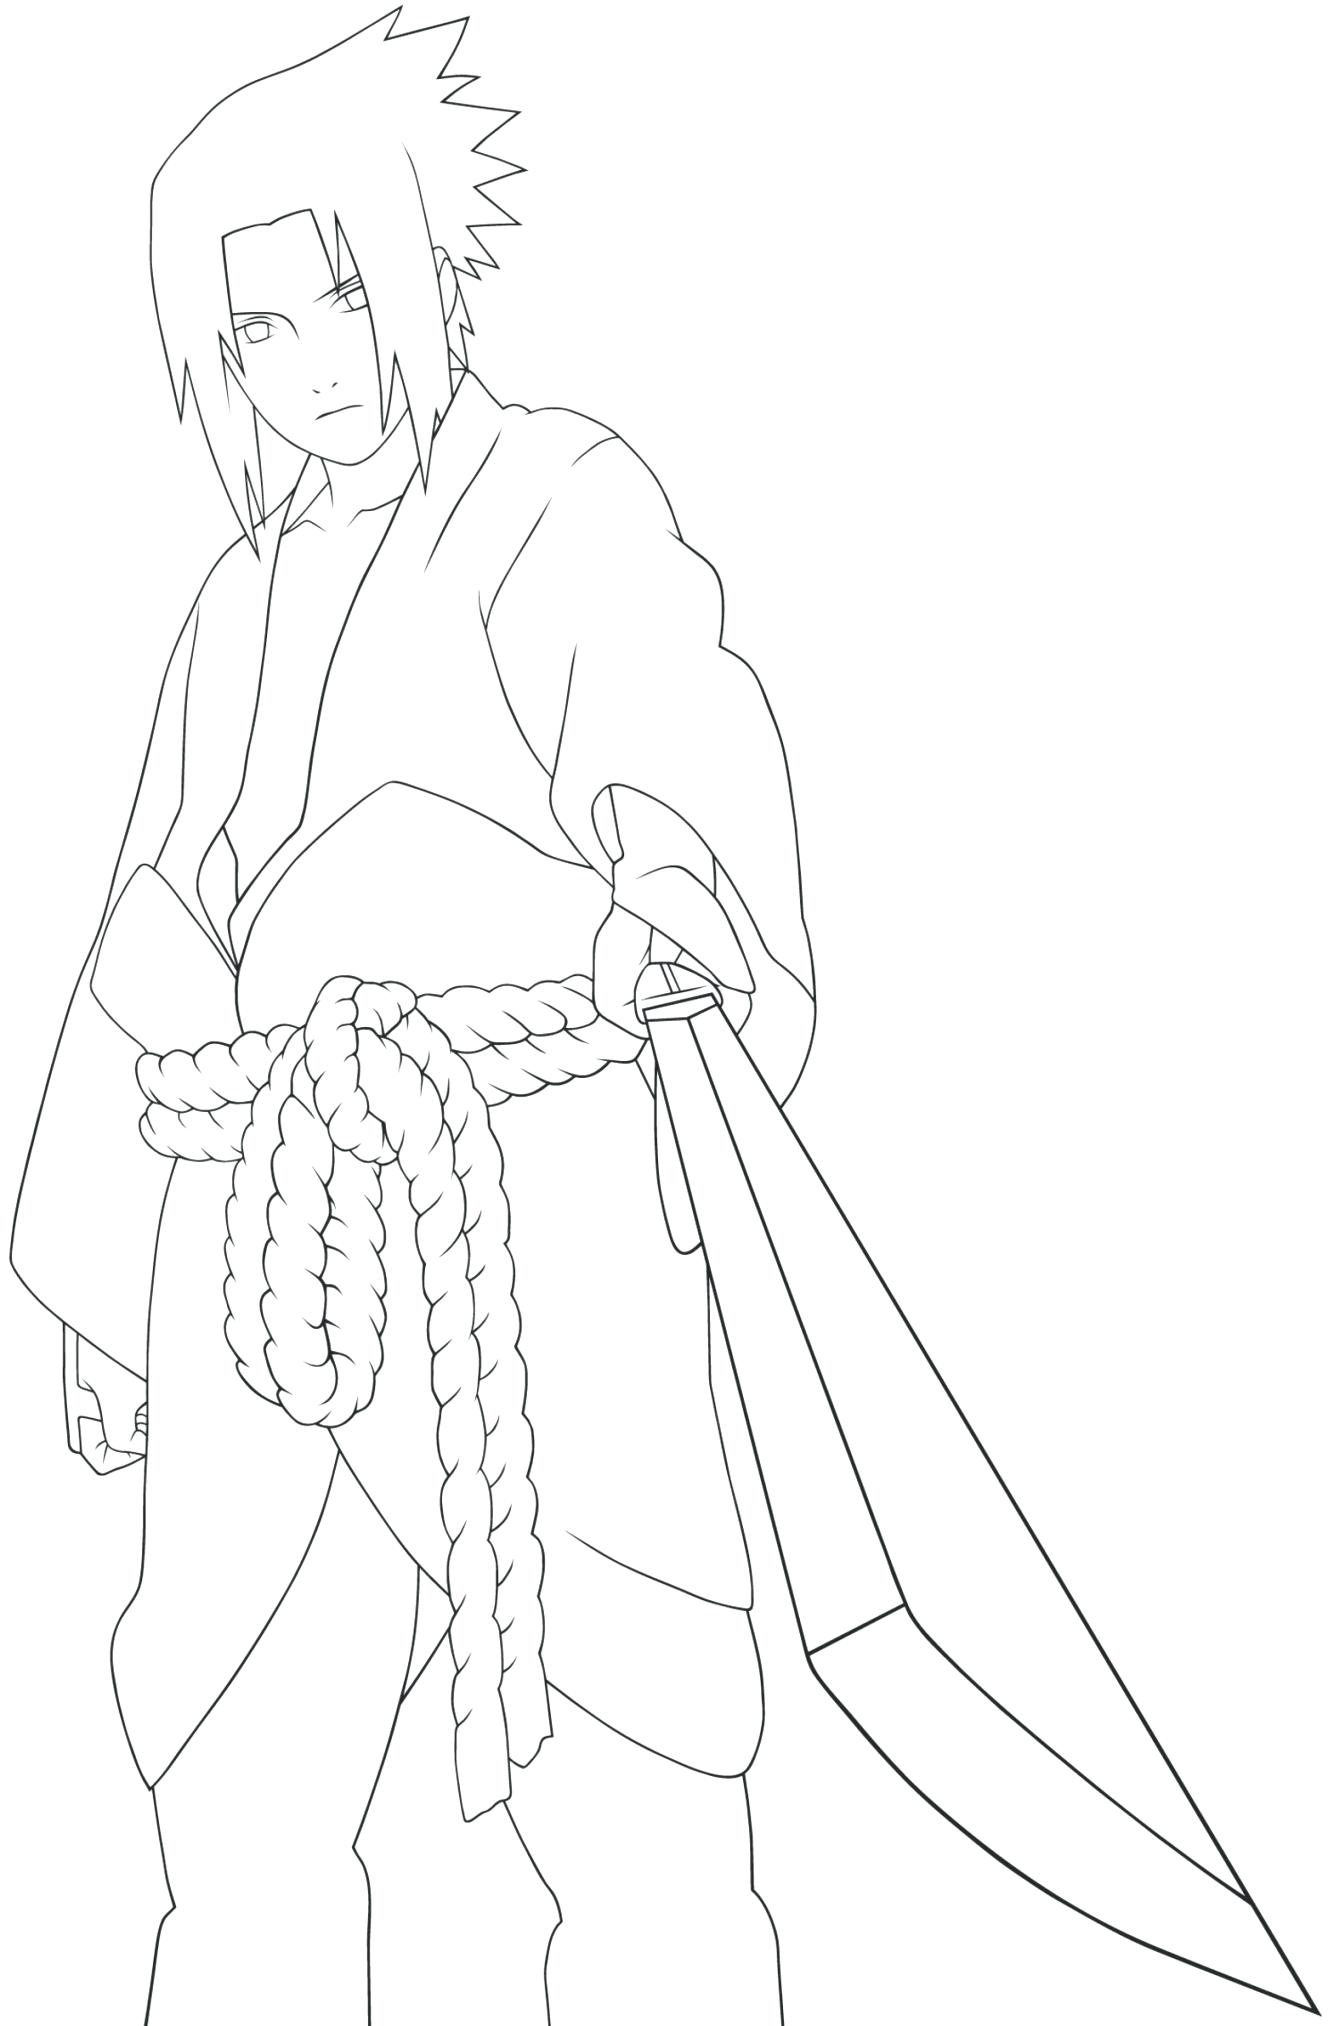 1328x2026 Coloring Pages Astonishing Sasuke Coloring Pages. Naruto